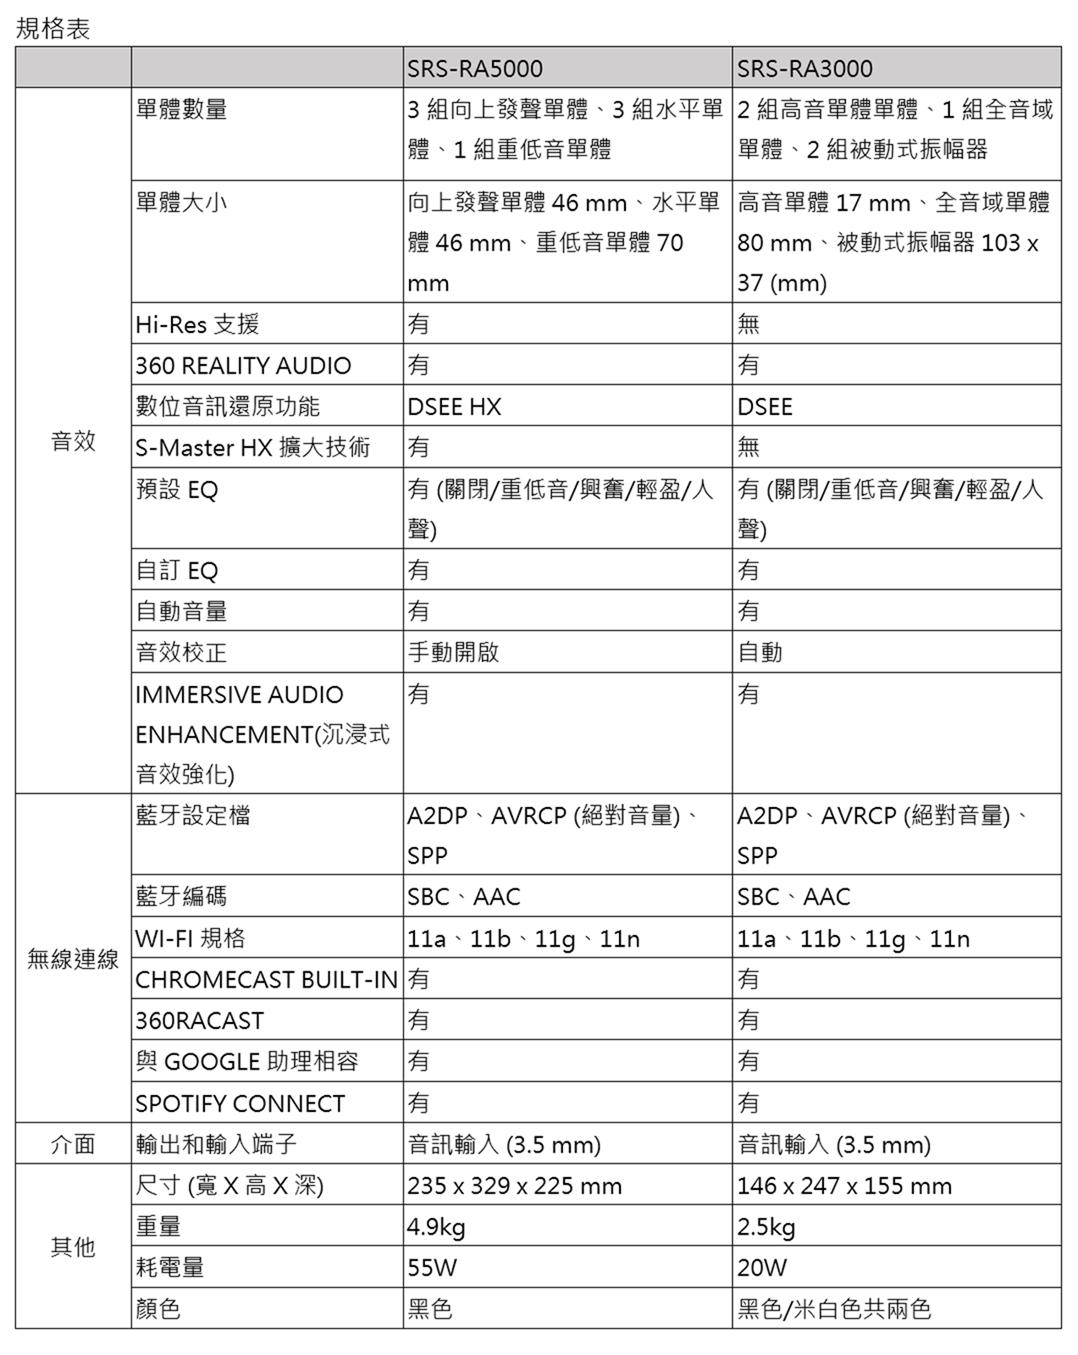 [CES 2021] Sony 旗艦無線揚聲器 SRS-RA5000, SRS-RA3000 簡約精品設計 全方位傳遞打造居家沉浸式音場氛圍 @3C 達人廖阿輝